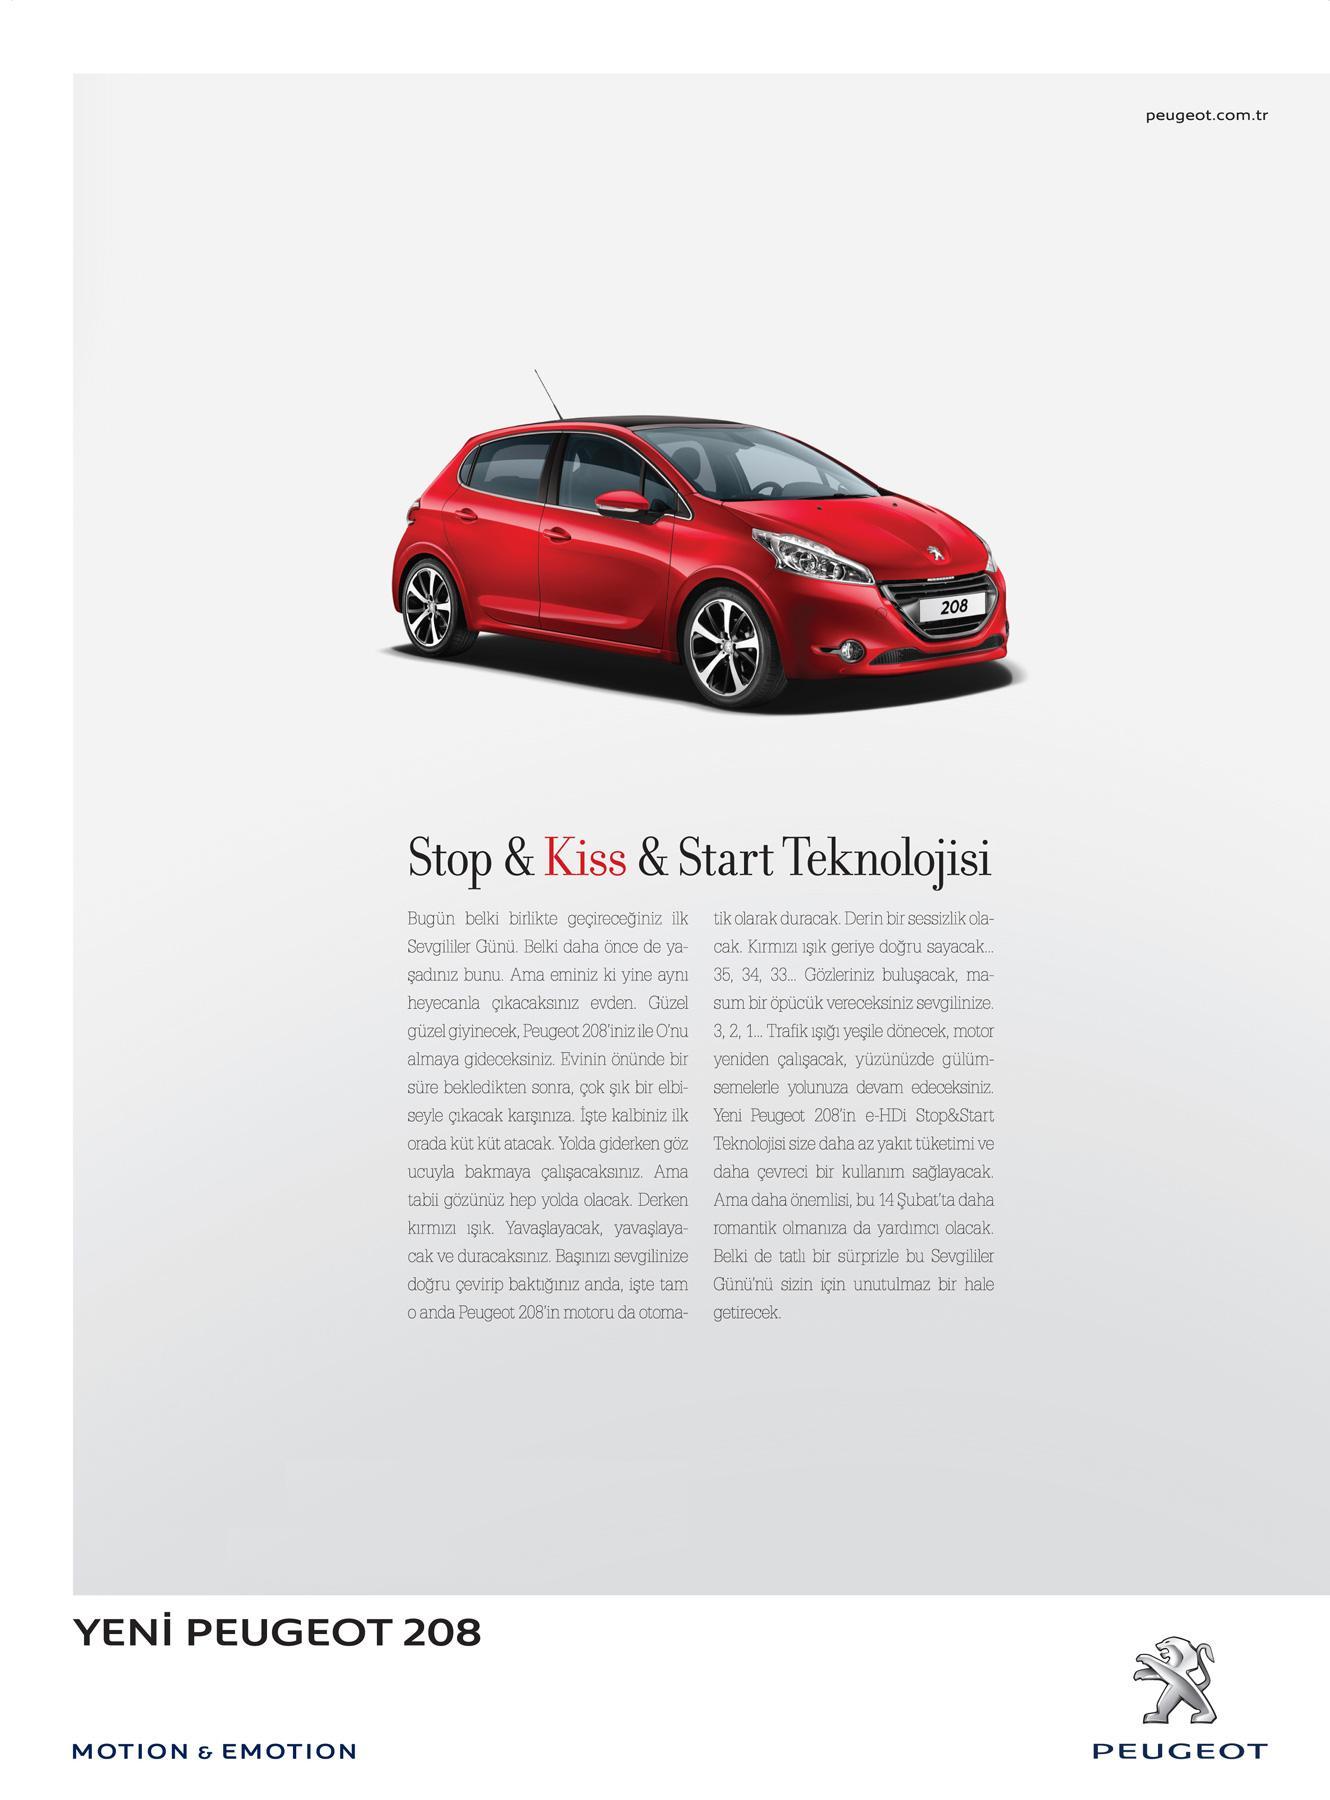 Peugeot Print Ad -  Stop & Kiss & Start